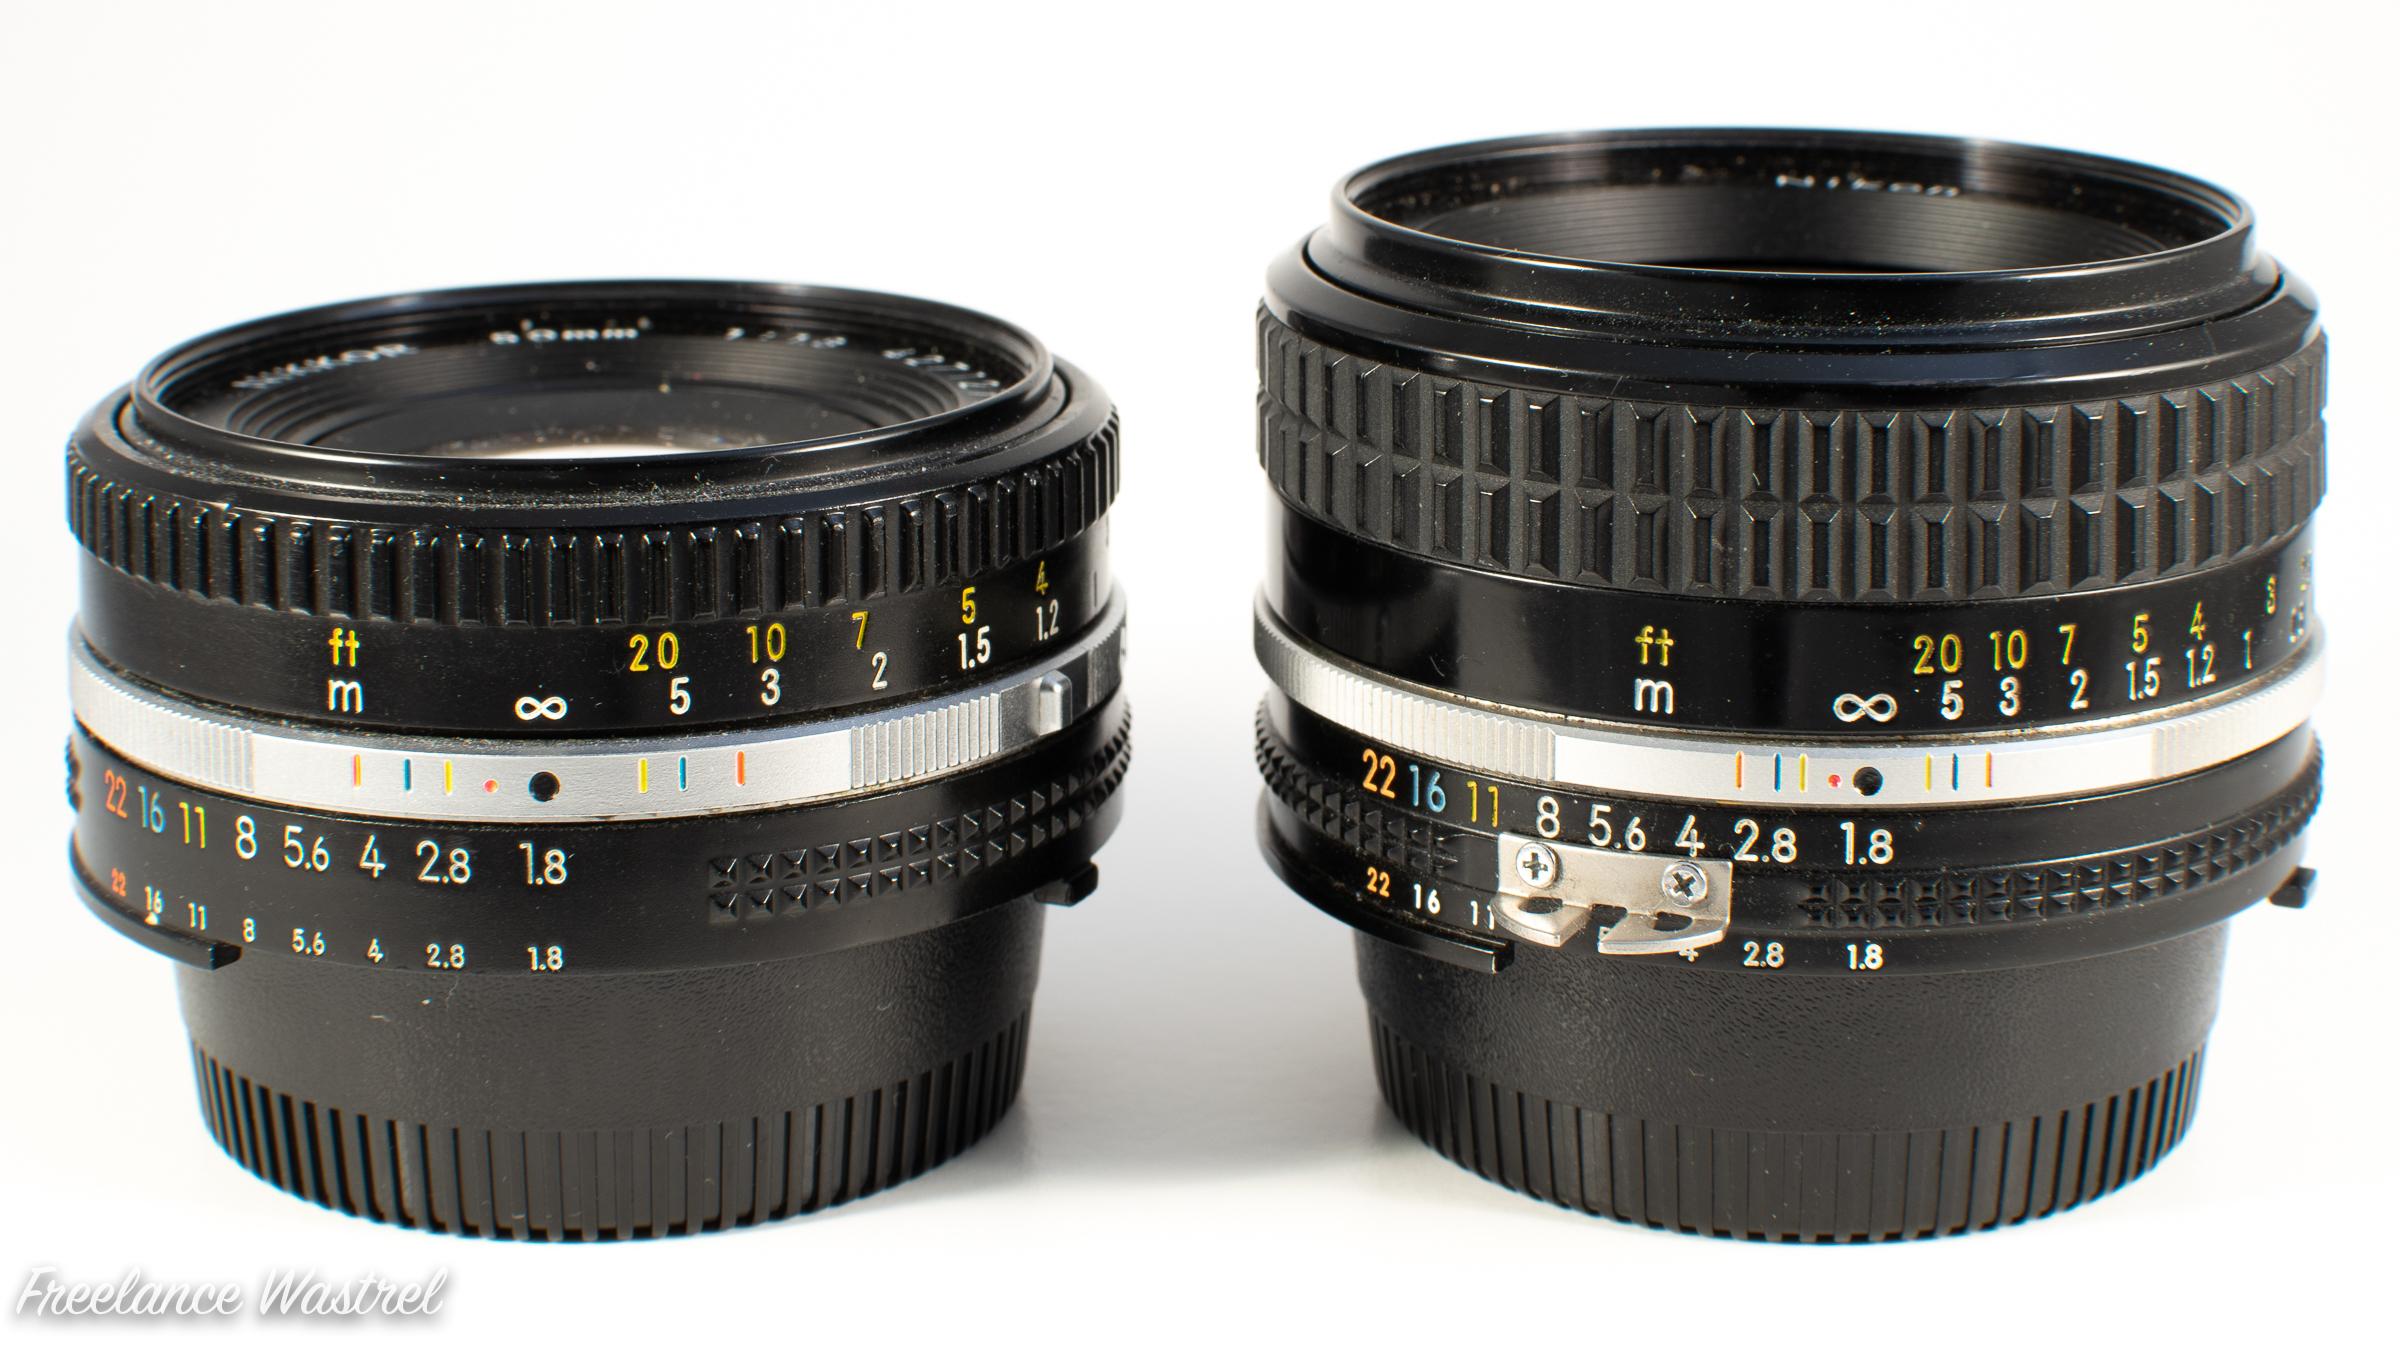 Nikkor 50mm lenses